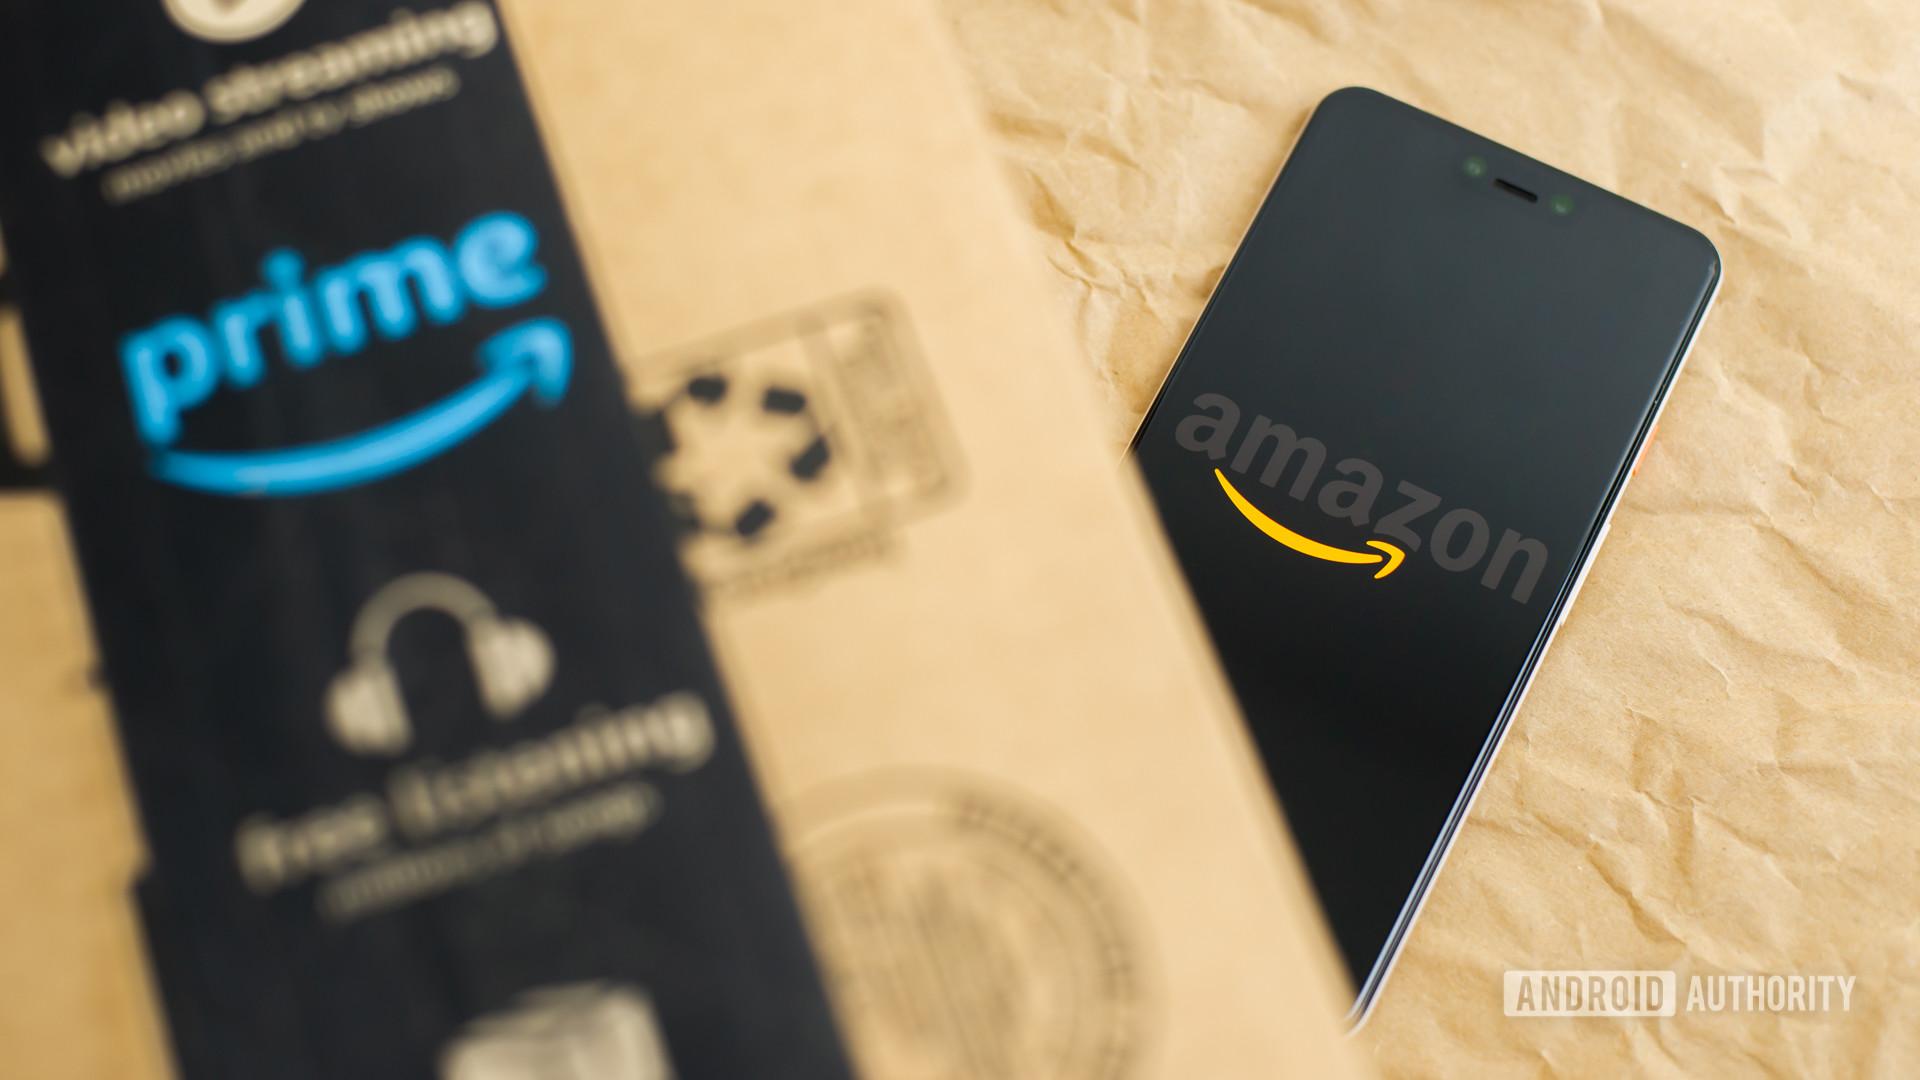 Amazon stock photo 2 - Google Play on Kindle Fire